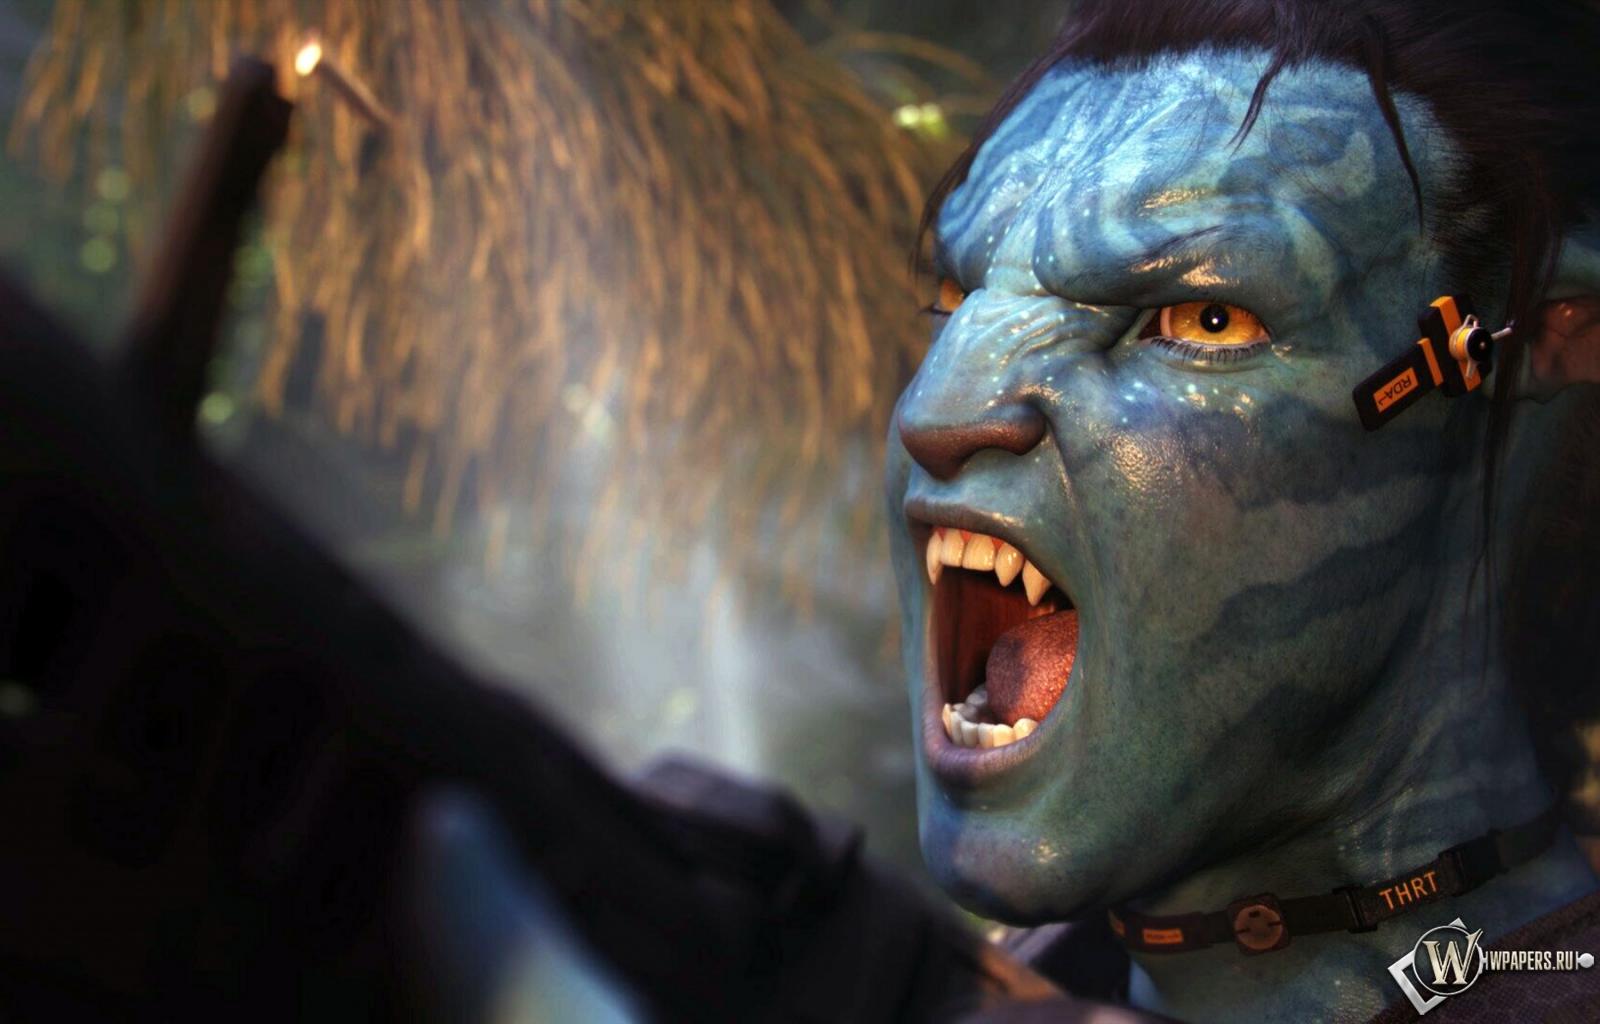 Джейк (Avatar) 1600x1024